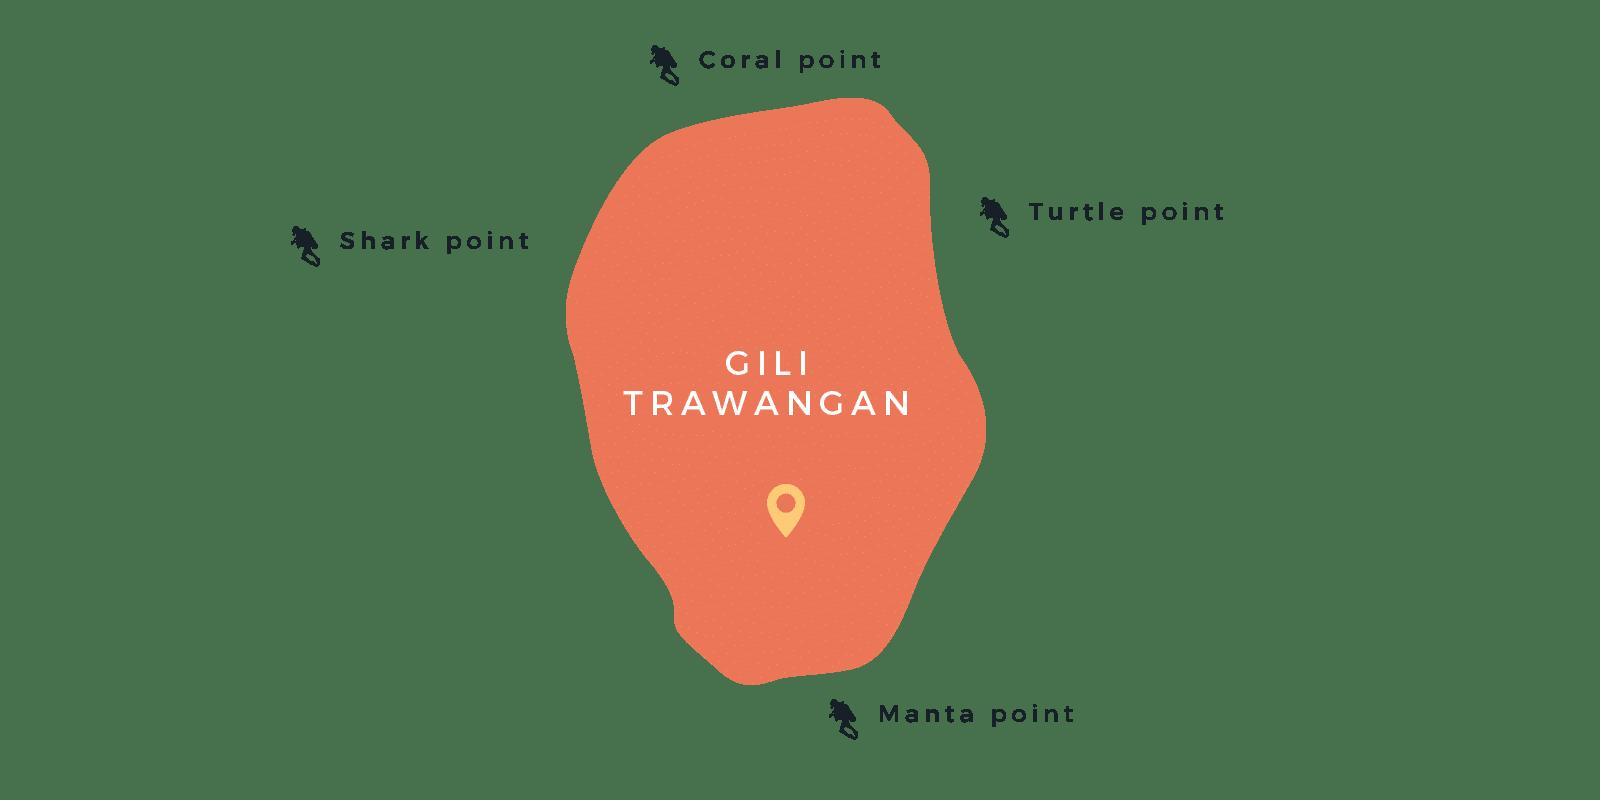 gilipoint - 5 jours à Gili Trawangan : notre avis et nos conseils